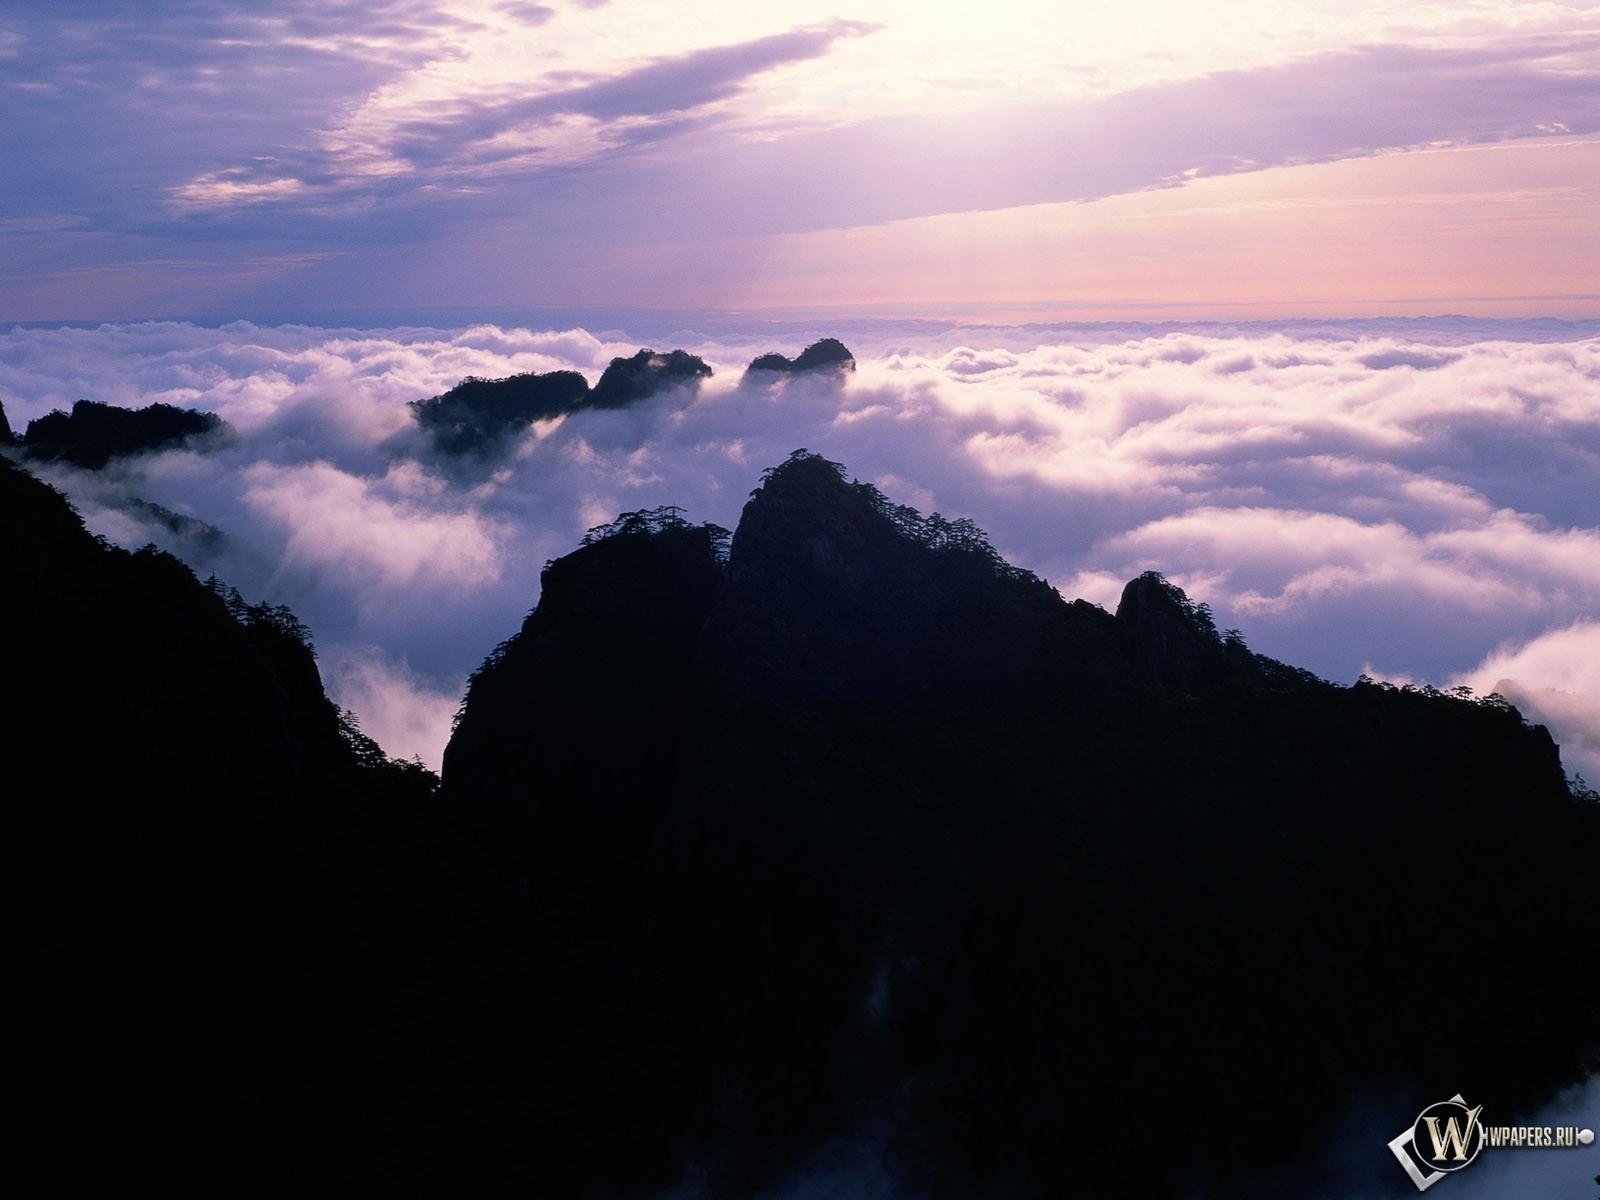 Горы над облаками 1600x1200